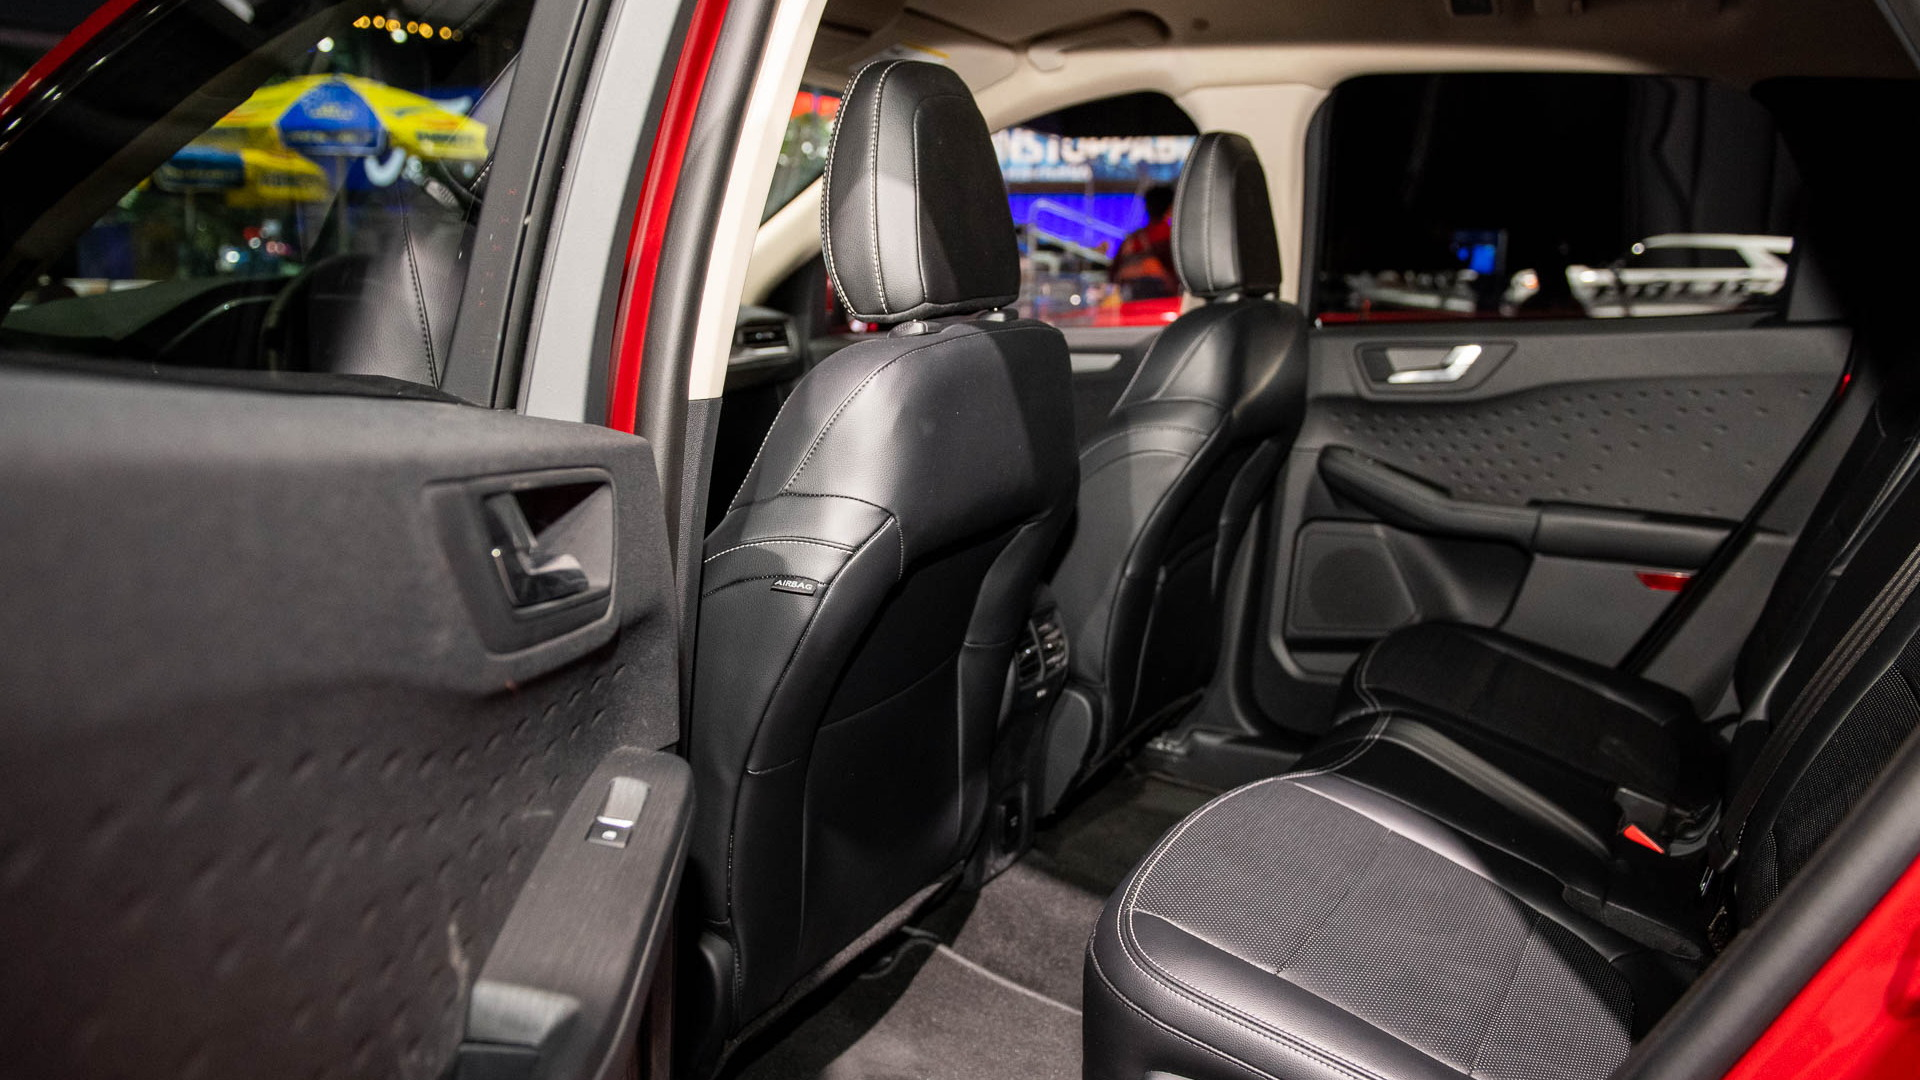 2020 Ford Escape, 2019 New York International Auto Show